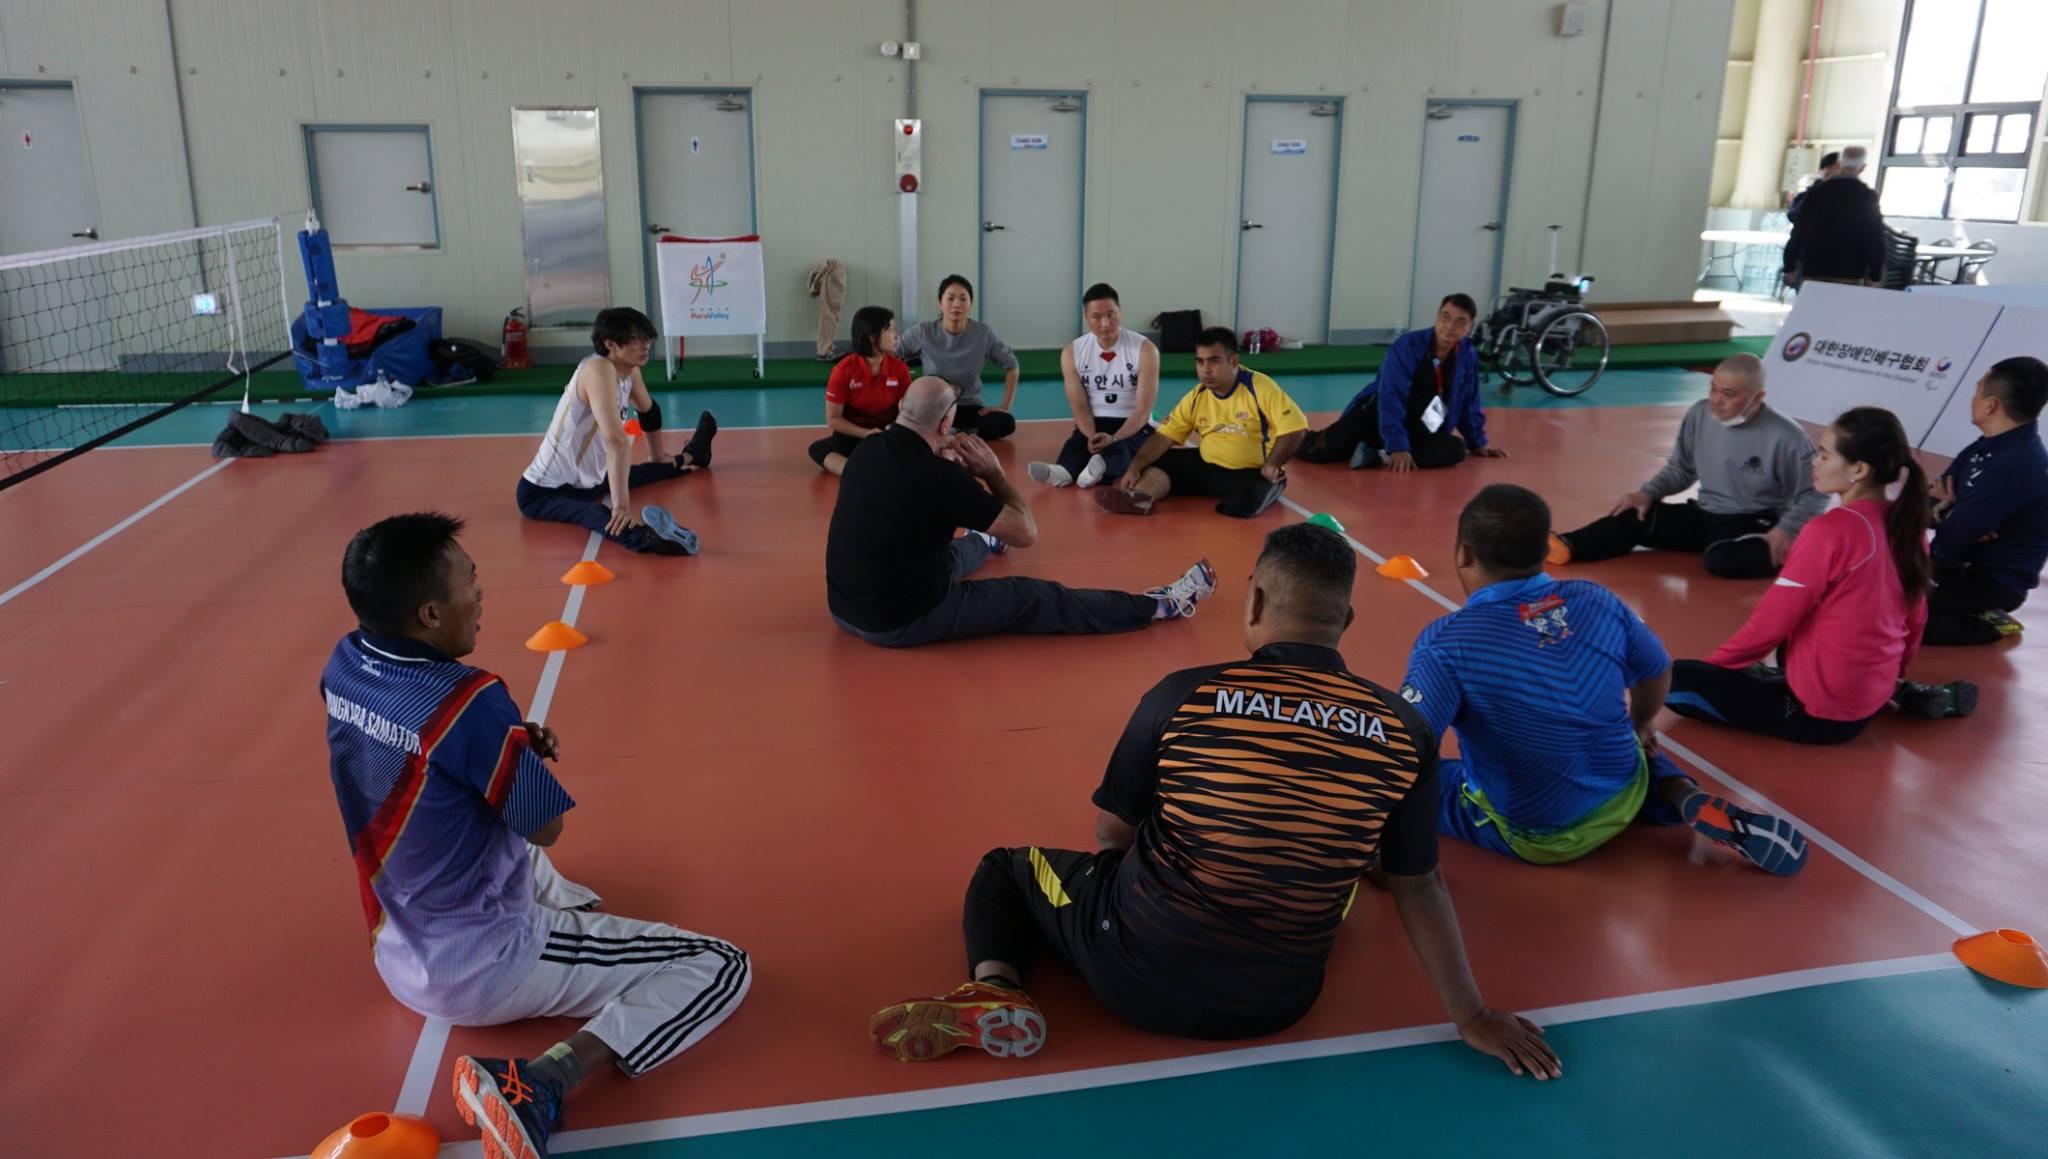 Weiping Tu sitting volleyball